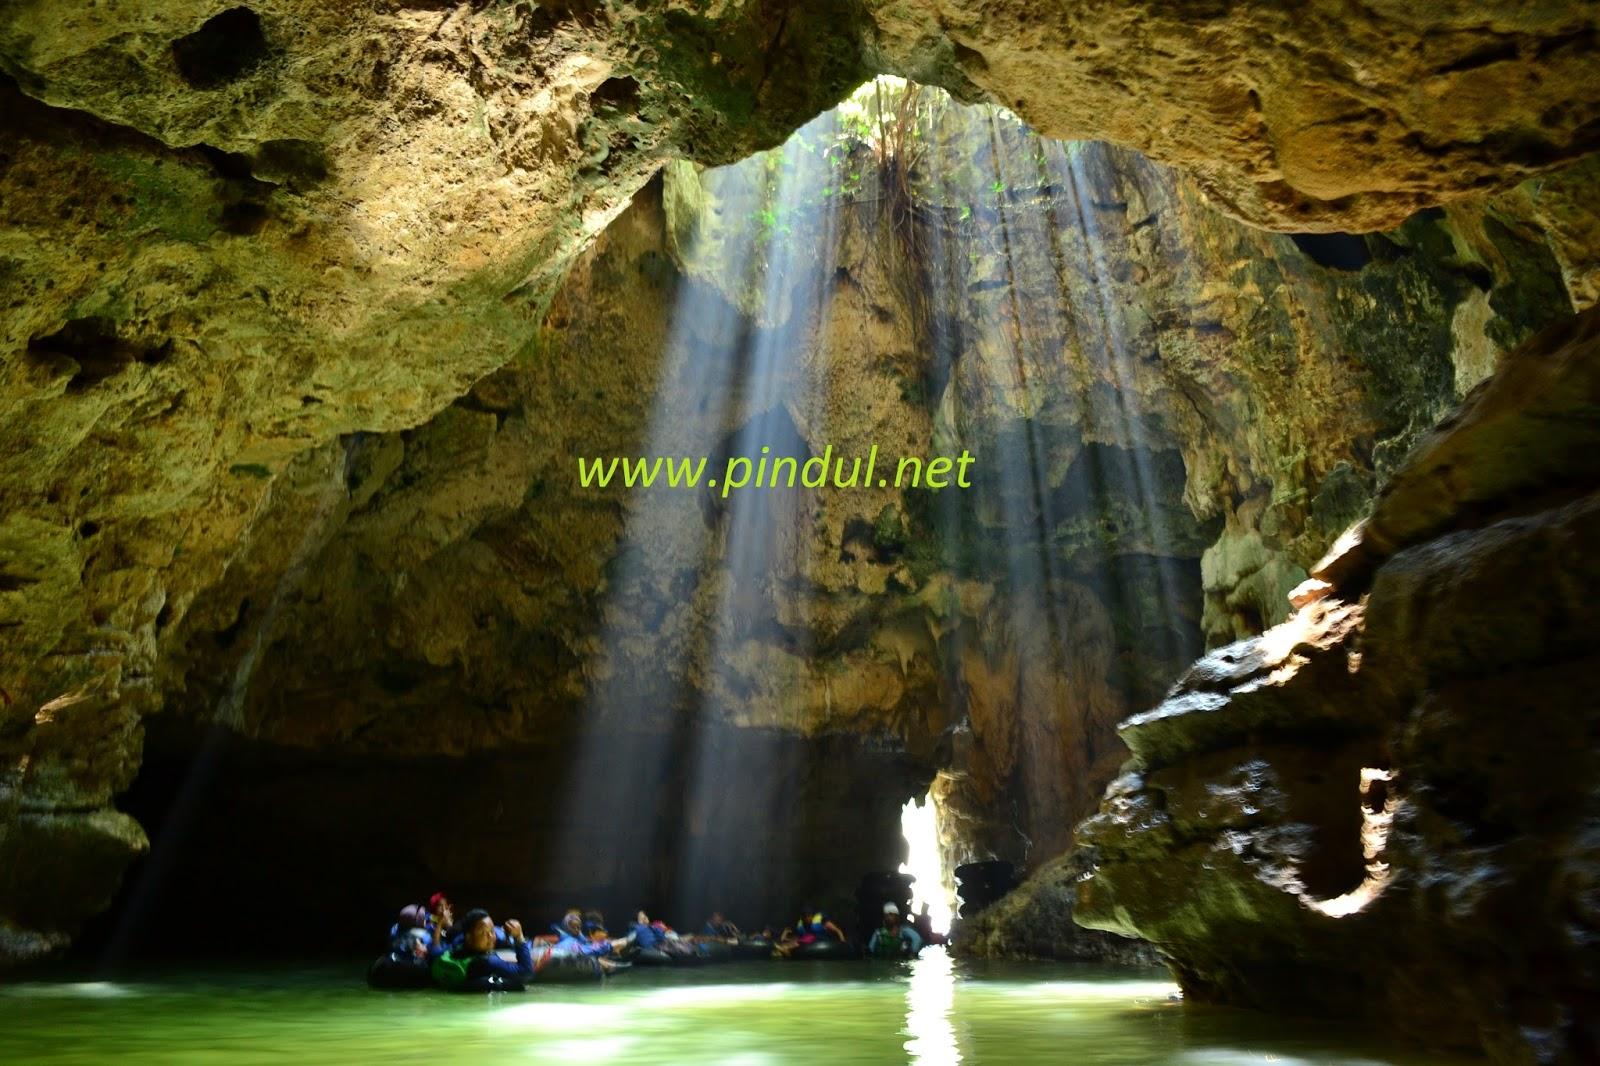 Sejarah Dan Asal Usul Wisata Goa Pindul Jogja Official 08122709533